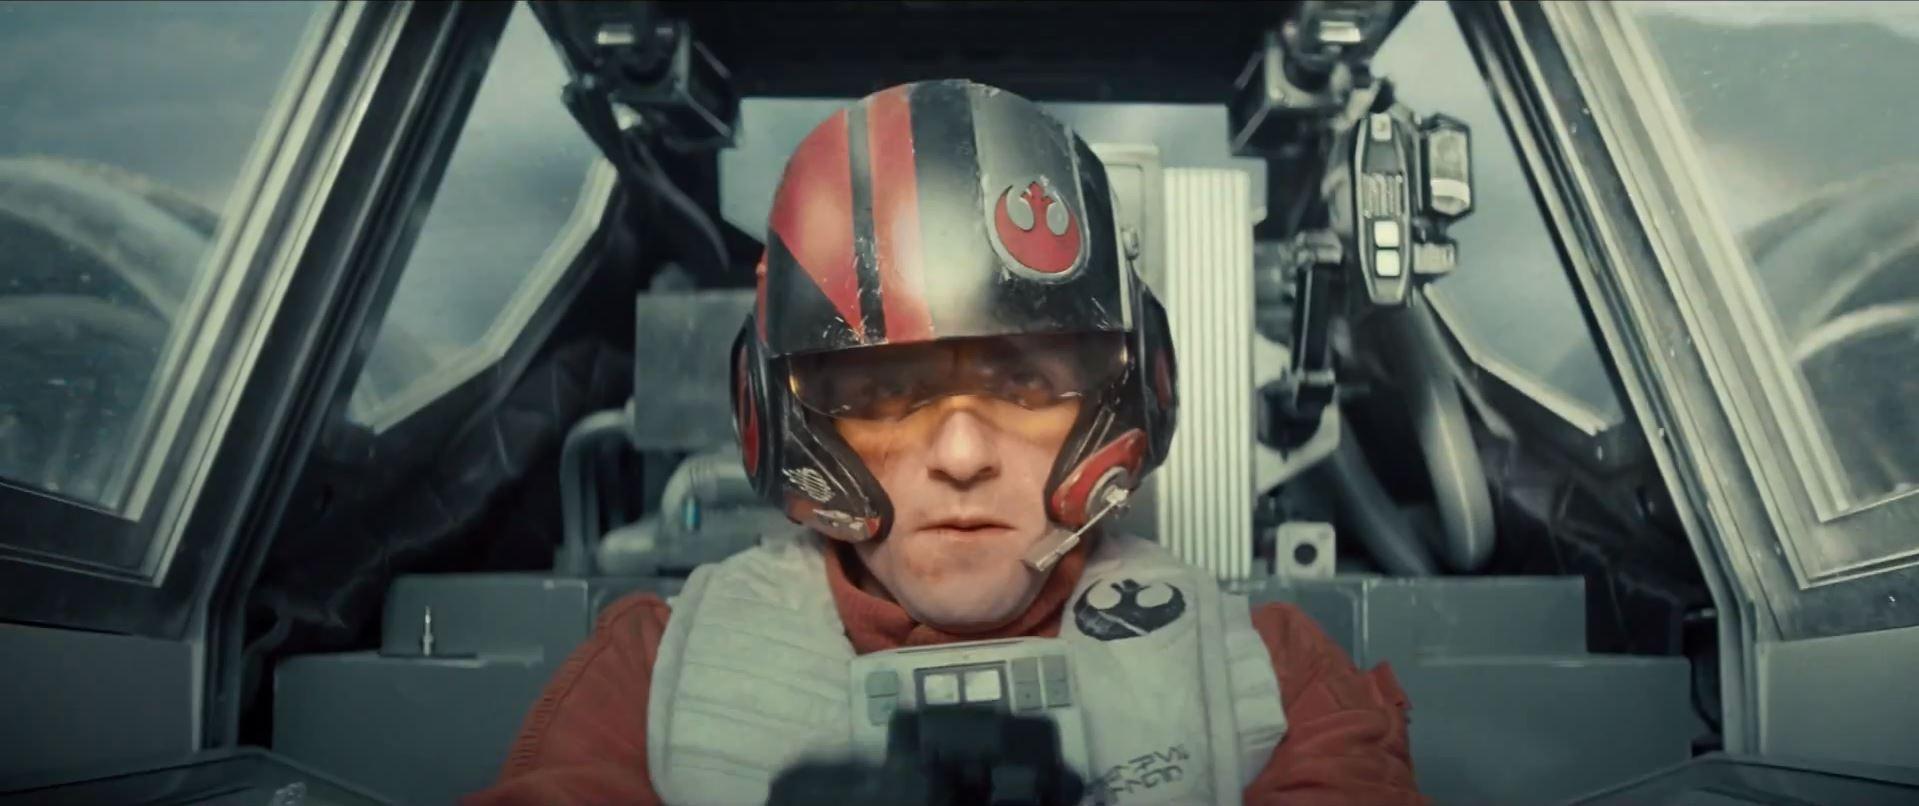 X-wing pilot -Star Wars Episode 7 trailer released